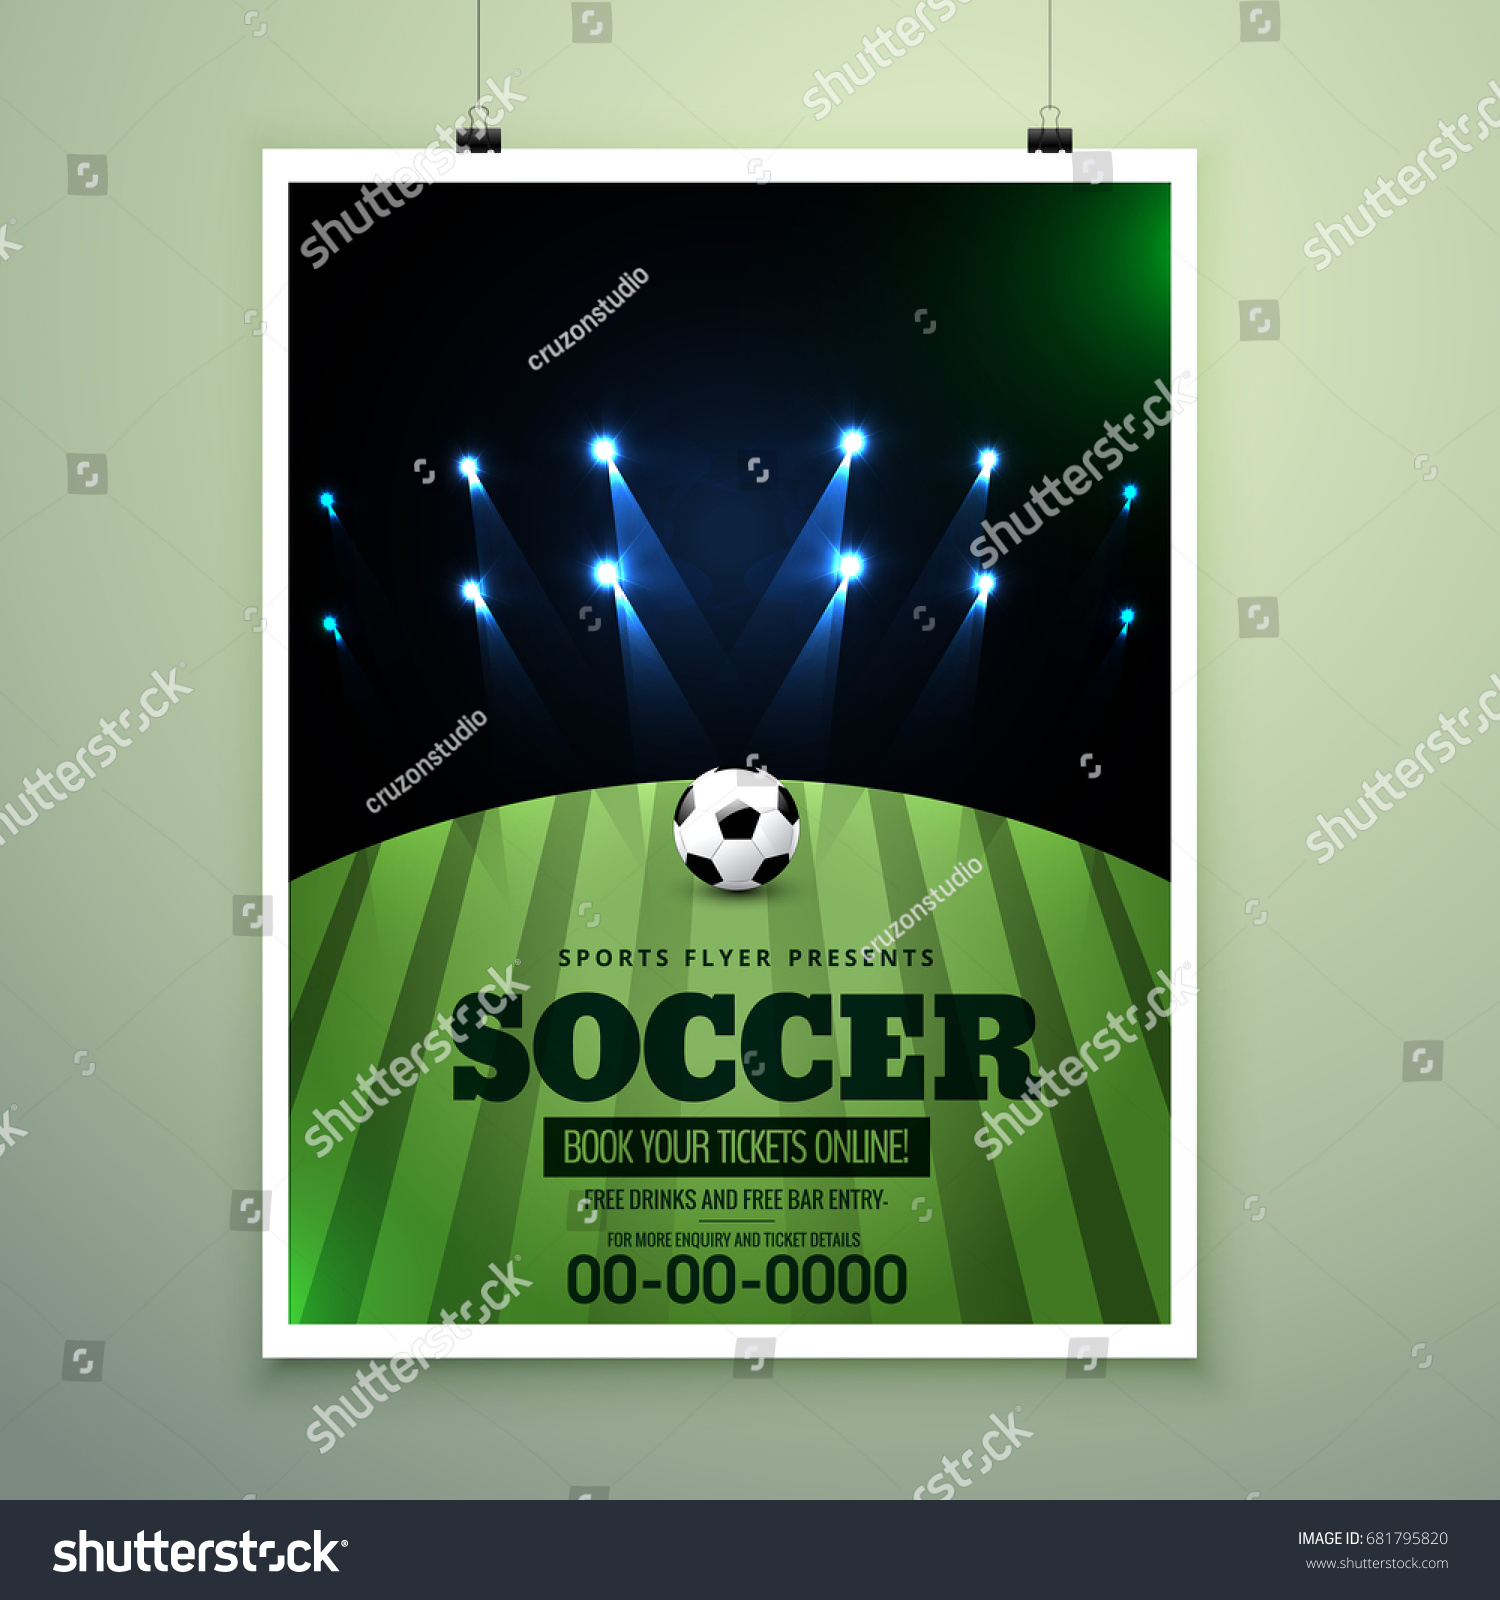 Soccer Event Flyer Template Eps10, Football Brochure, Soccer Magazine Cover.